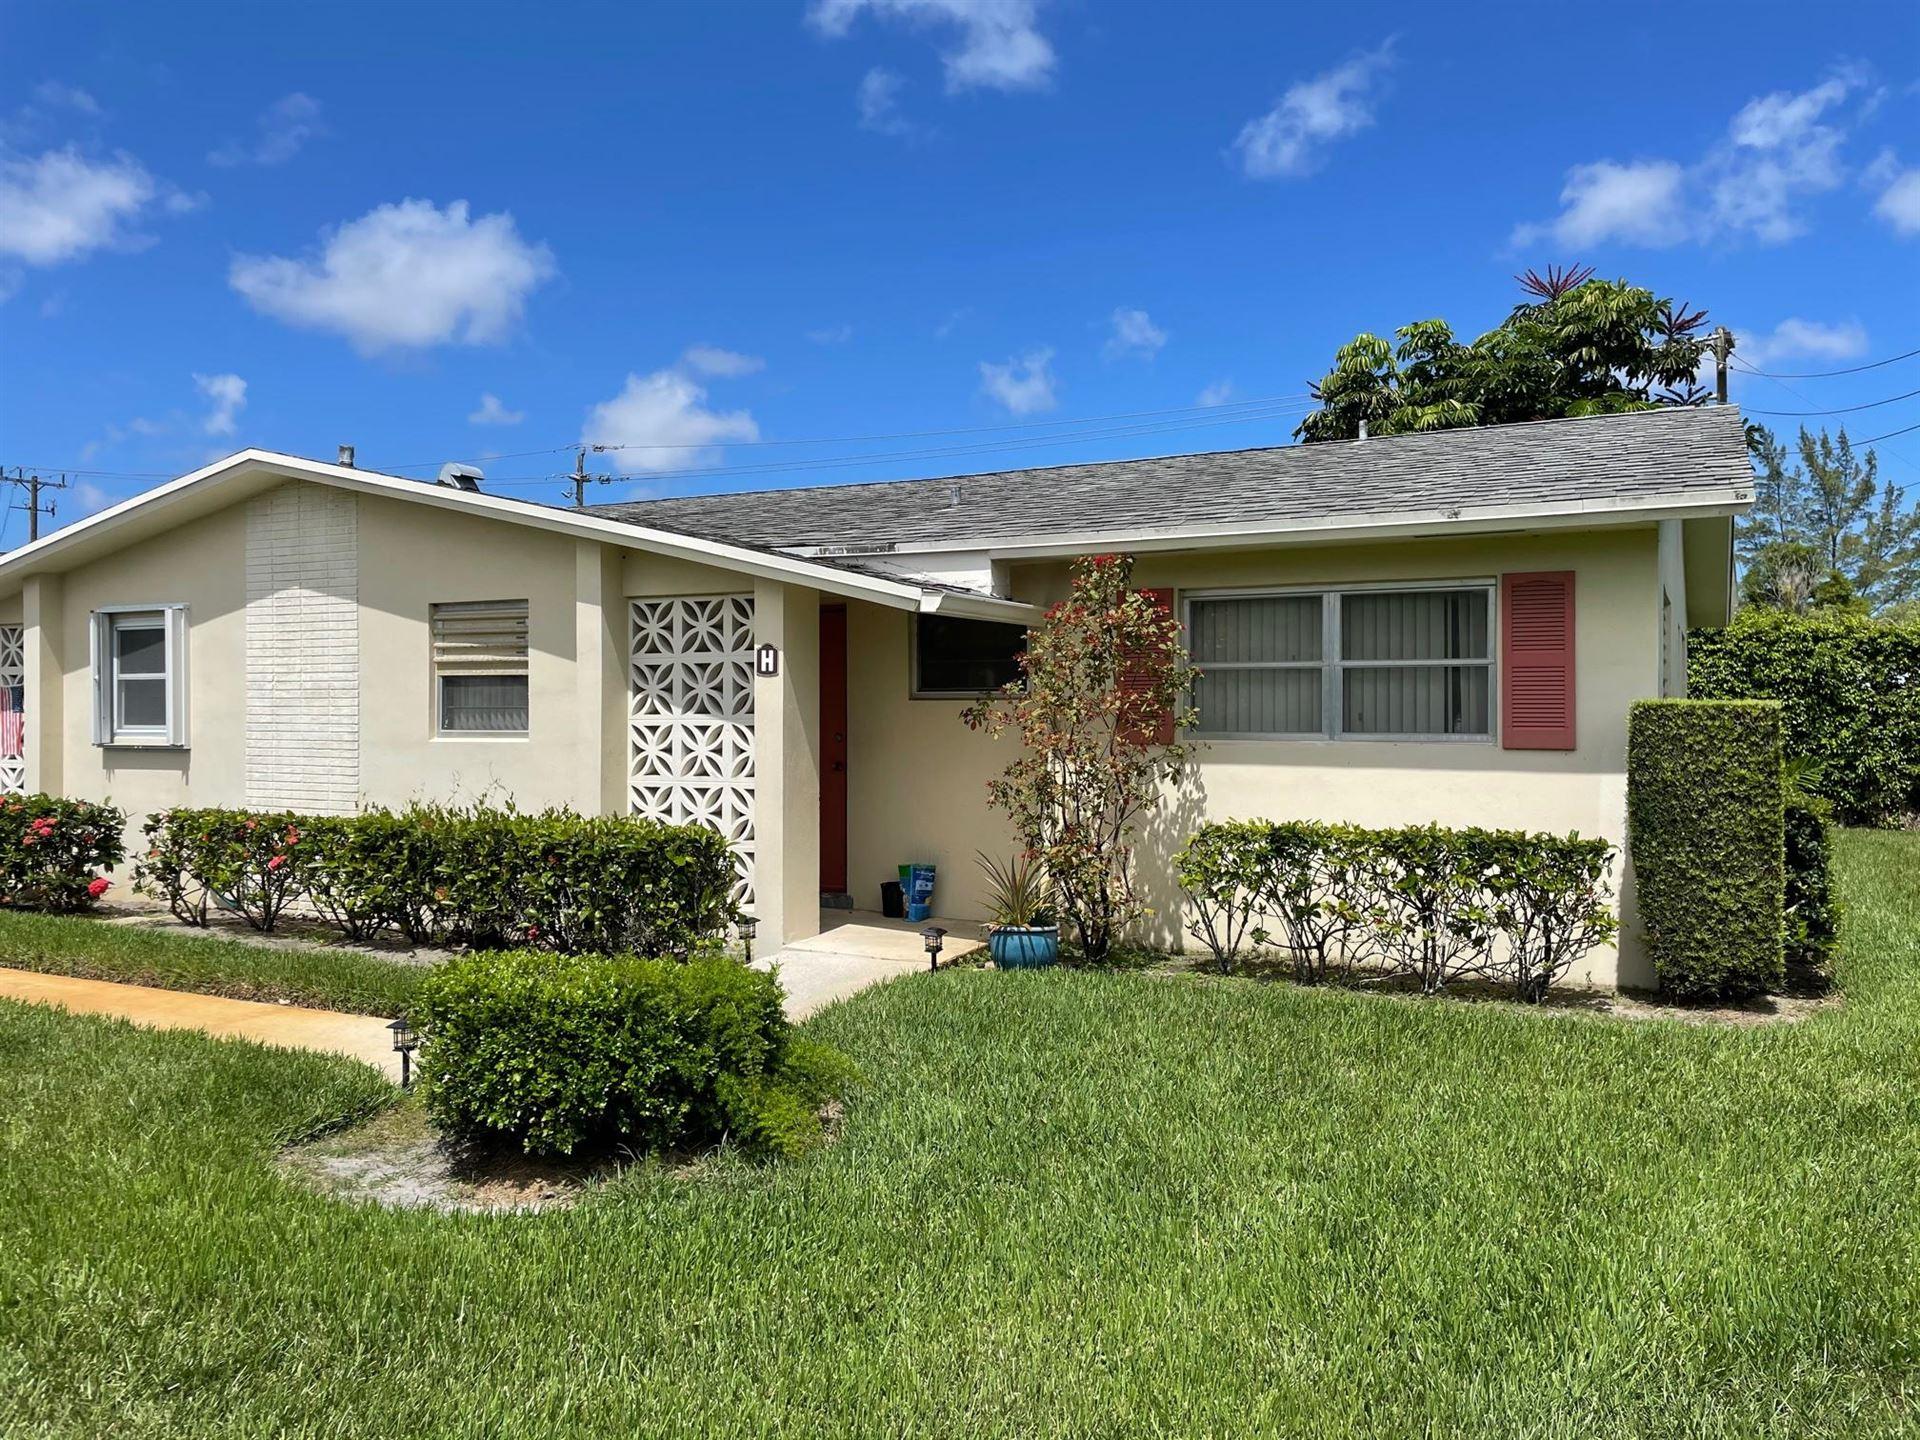 2946 Ashley Drive E #Apt. H, West Palm Beach, FL 33415 - MLS#: RX-10731894